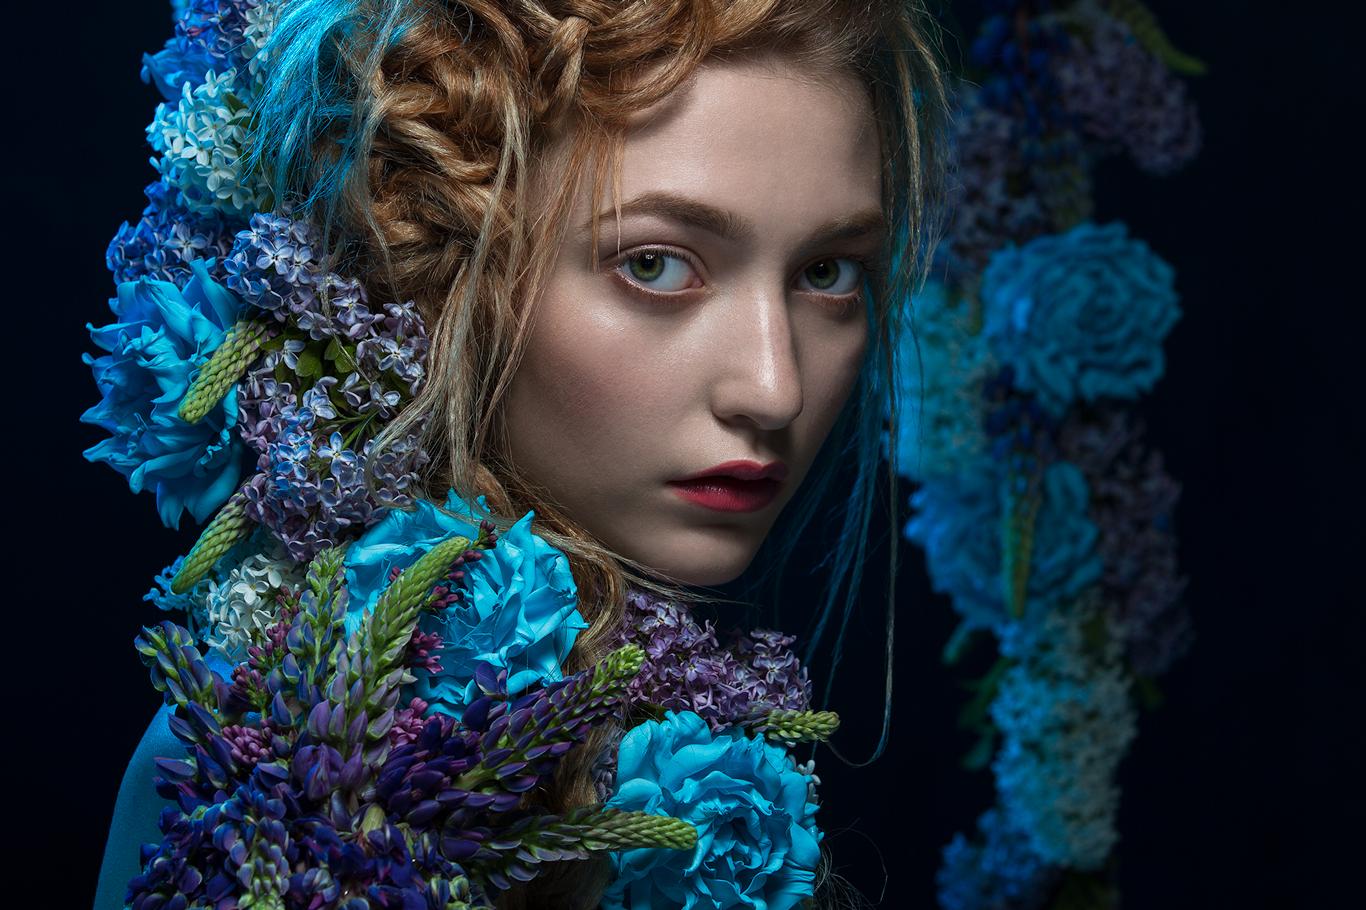 Alina Levkina Beauty Retouching